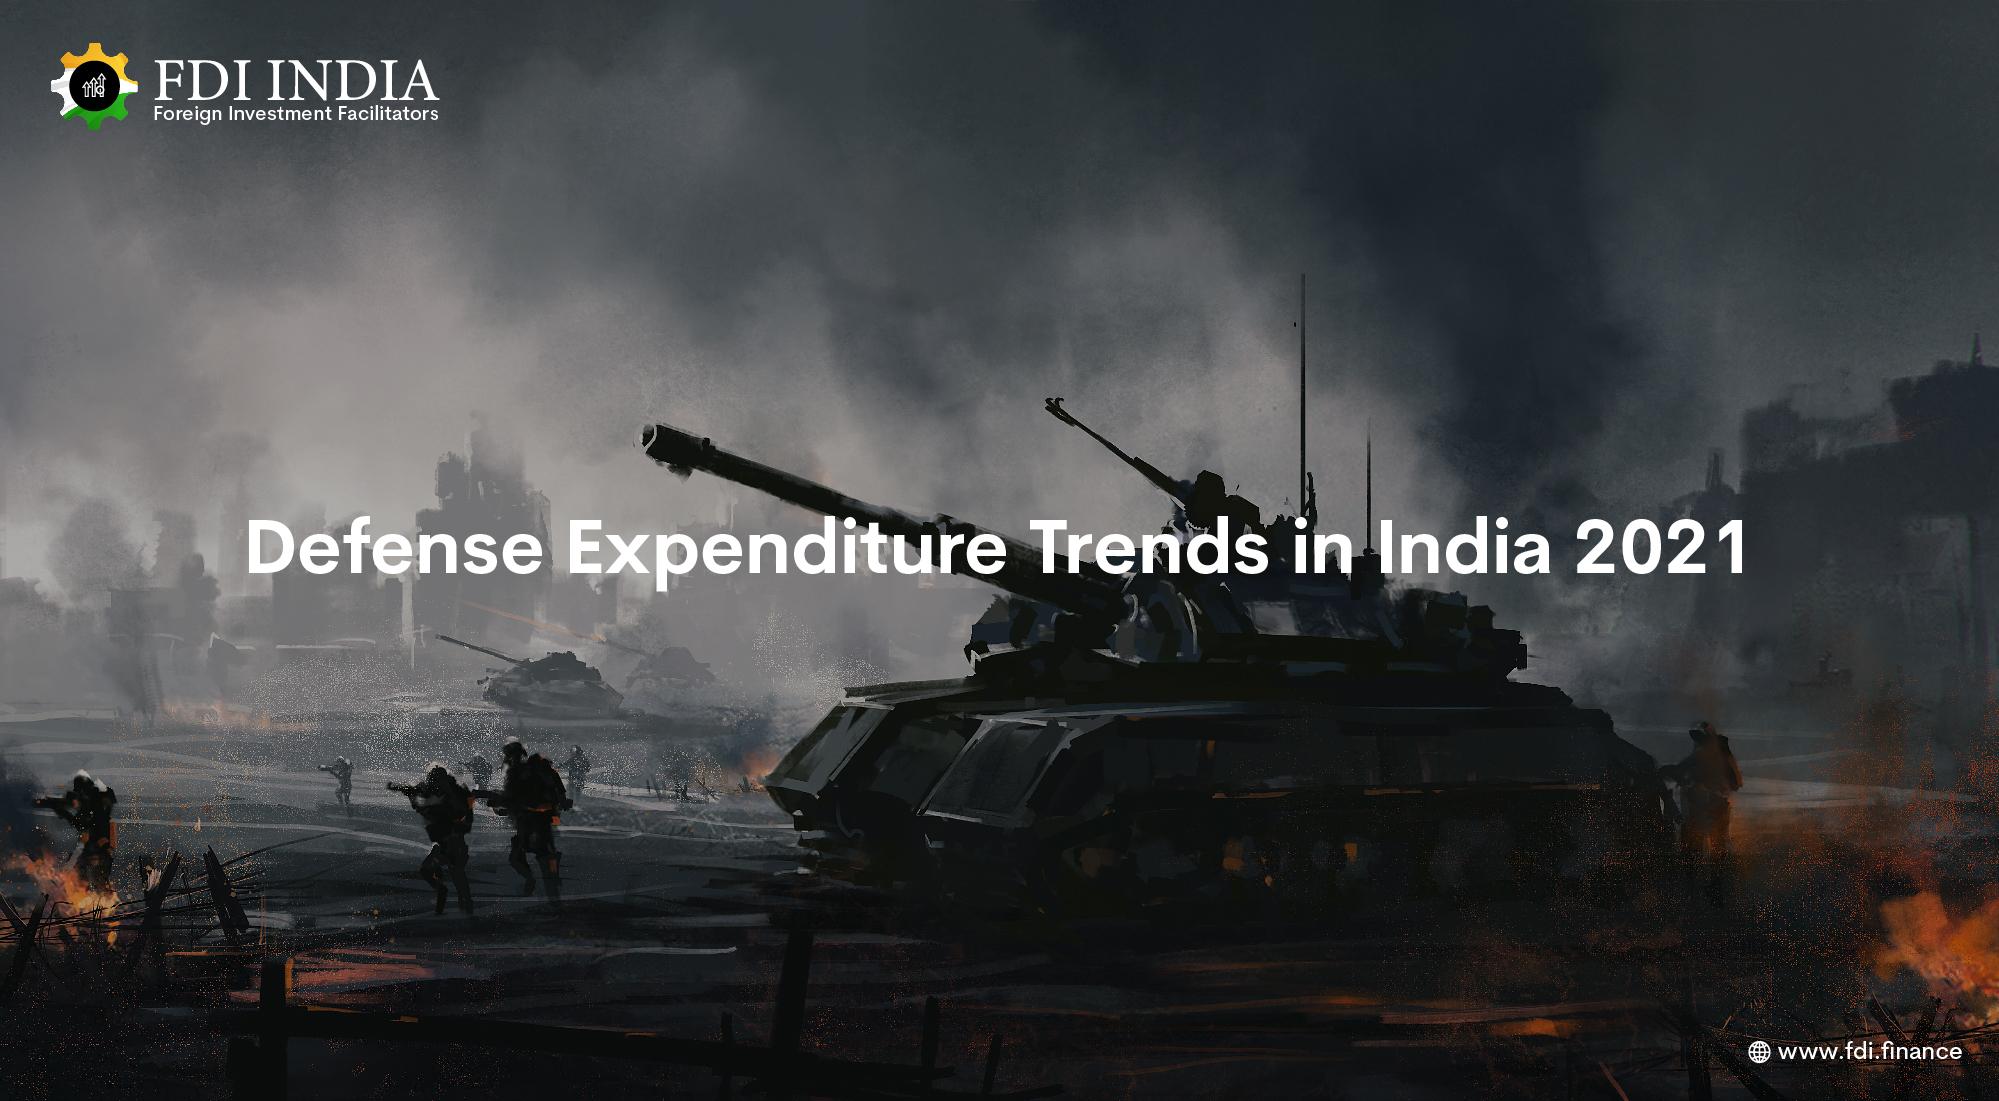 Defense Expenditure Trends in India 2021